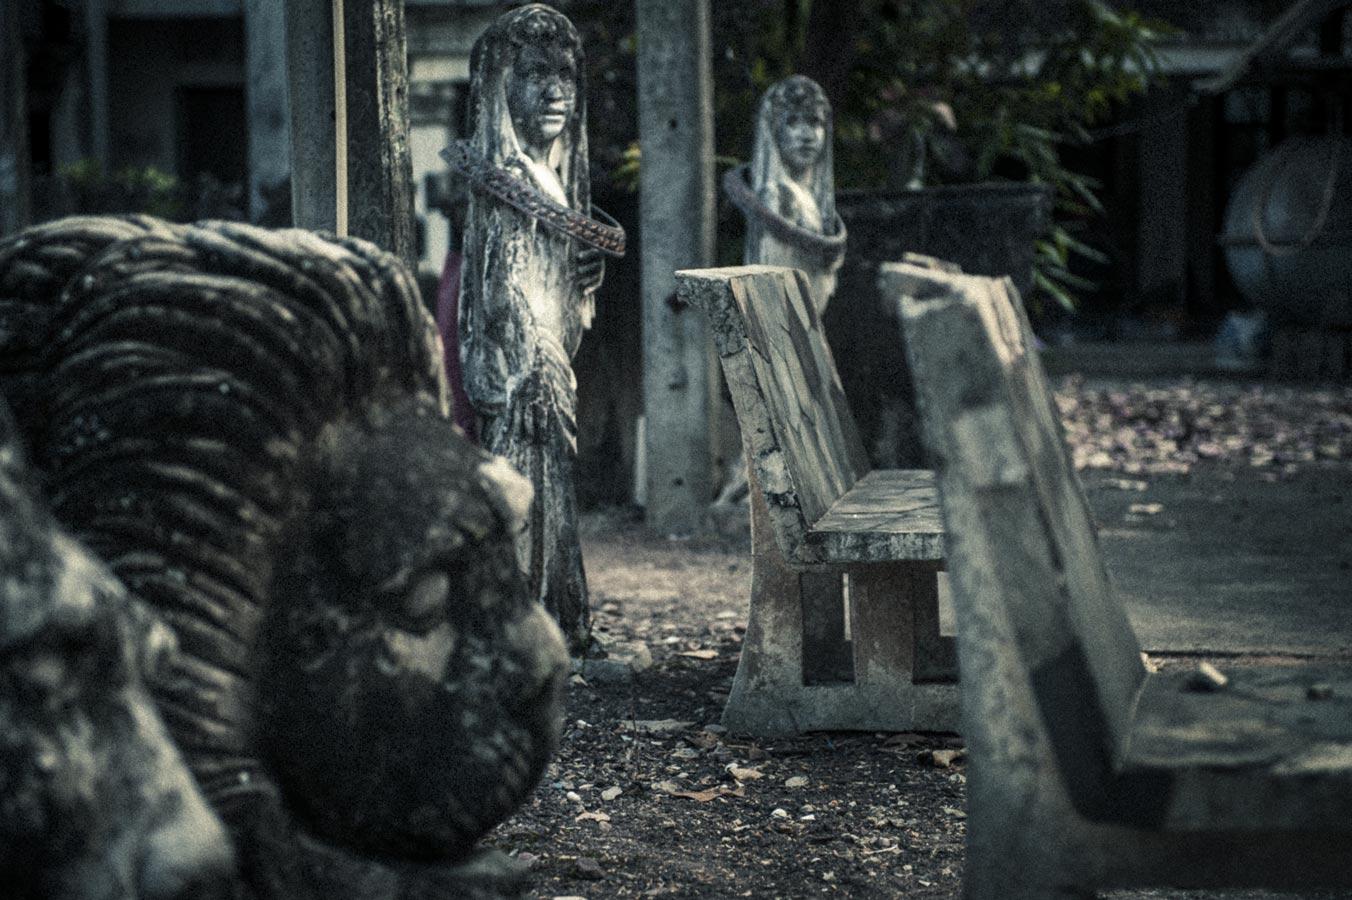 Jamie-Lowe-Photography-Haunted-House-Chiang-Mai-27.jpg